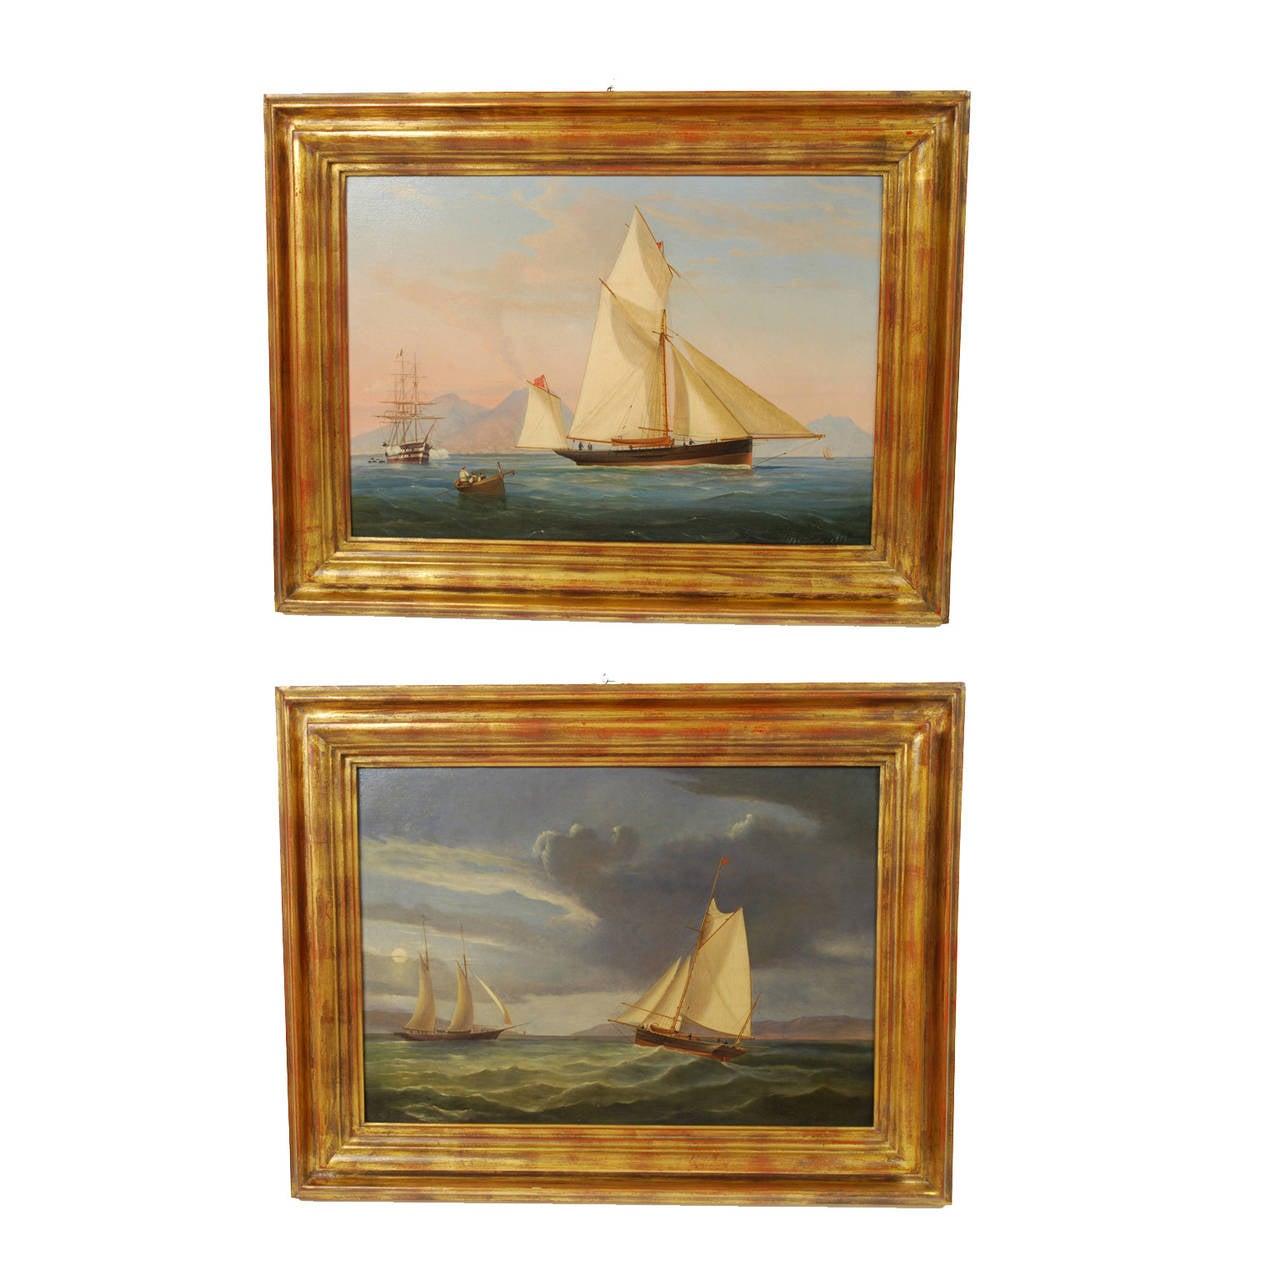 1862 De Simone Pair of Oil on Canvas Paintings